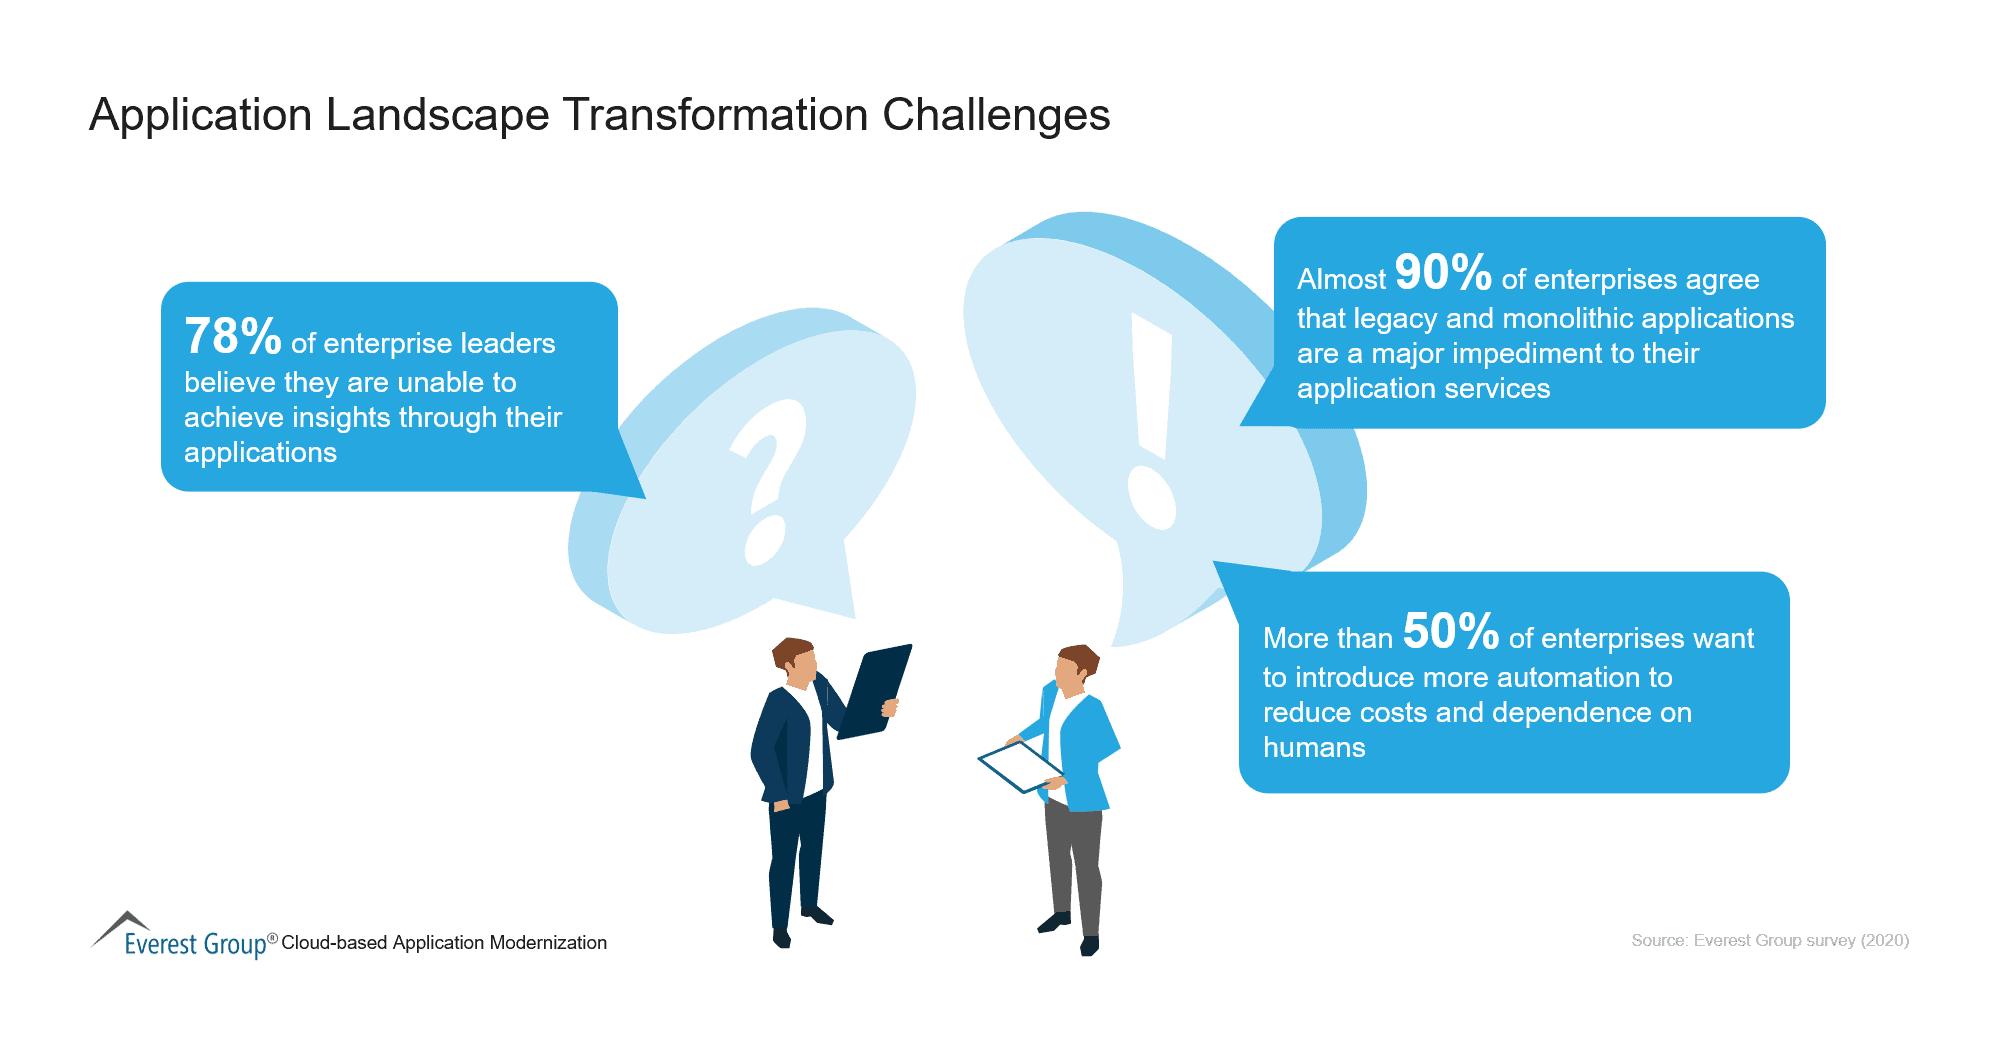 Application Landscape Transformation Challenges